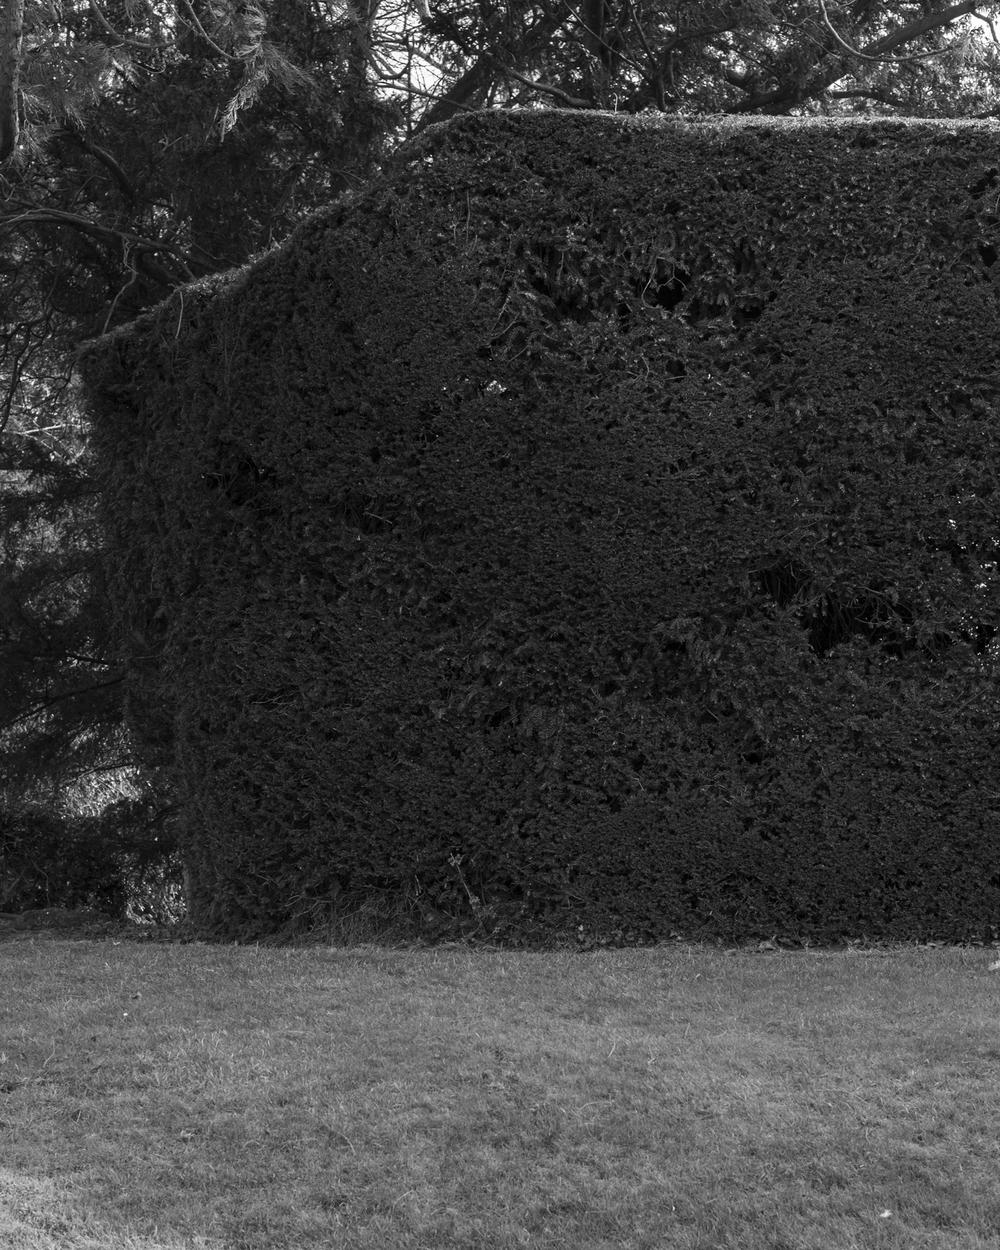 Hedge_2443.jpg